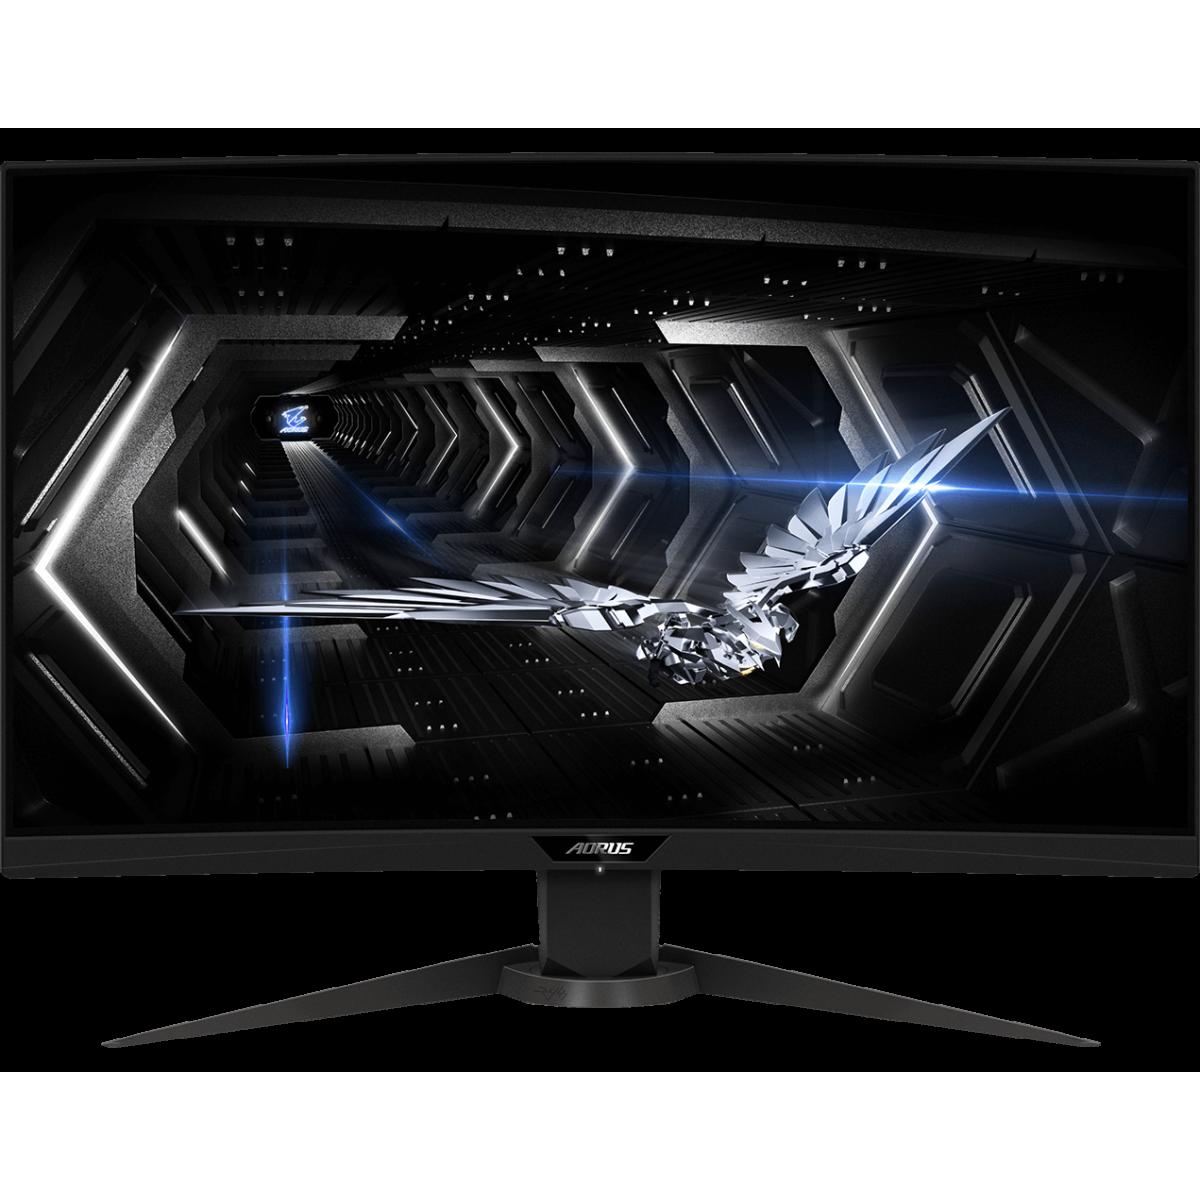 Monitor Gamer Gigabyte Aorus CV27Q, 27 Pol, QuadHD, 165Hz, 1ms, VA, FreeSync, HDR, DP/HDMIx2, 20VM0-ACV27QBA-1SAR